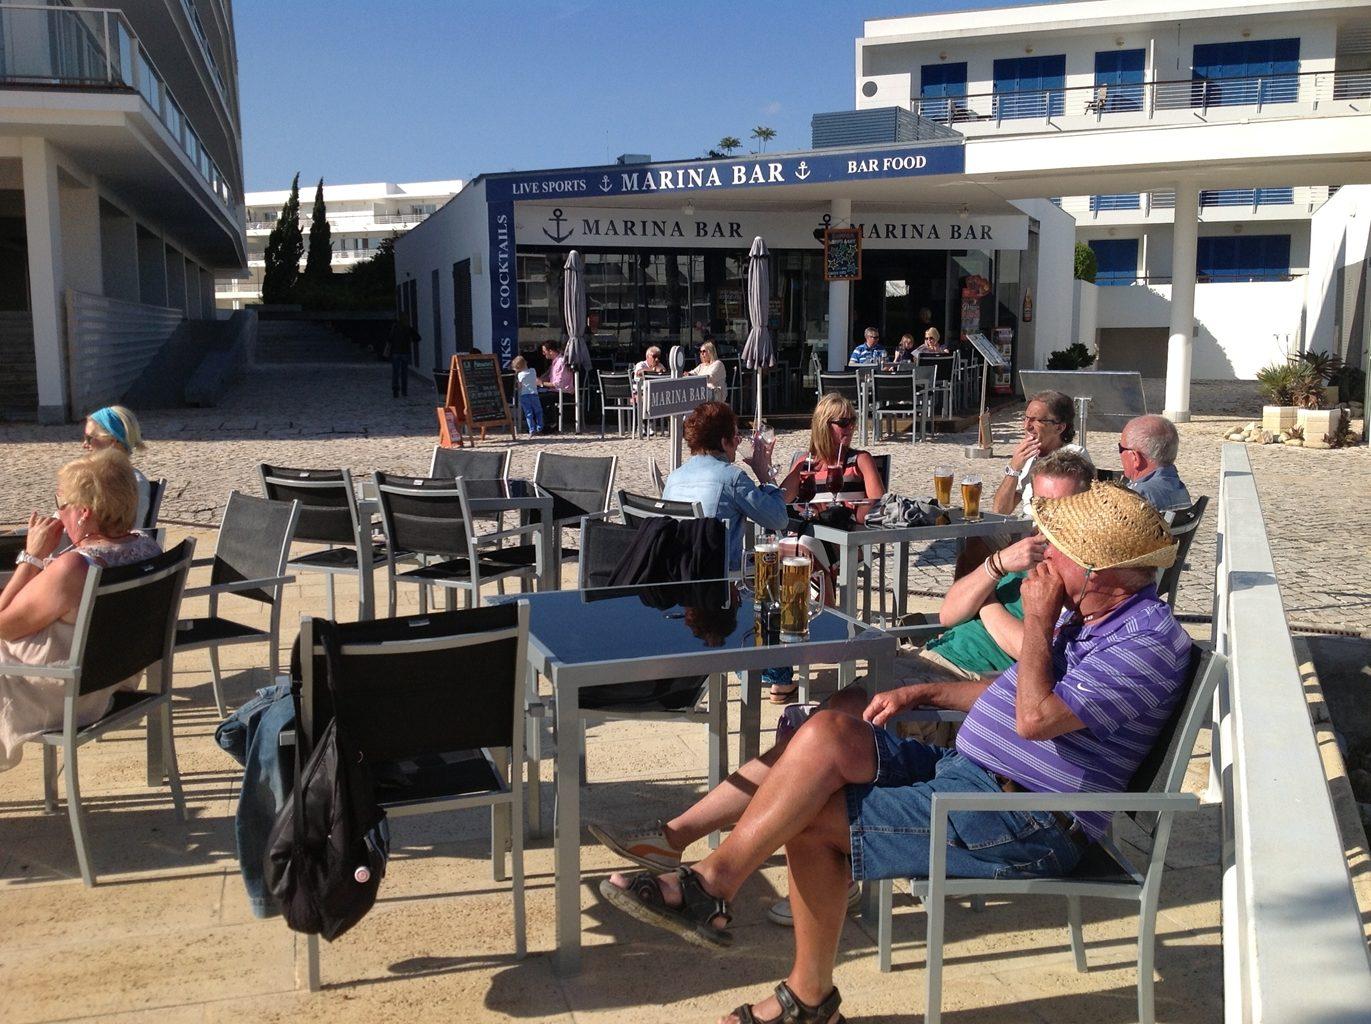 Marina Bar Lagos Friendly Bar in Lagos Portugal 16 - Sports Bar Lagos and Restaurant Bar Lagos Algarve portugal